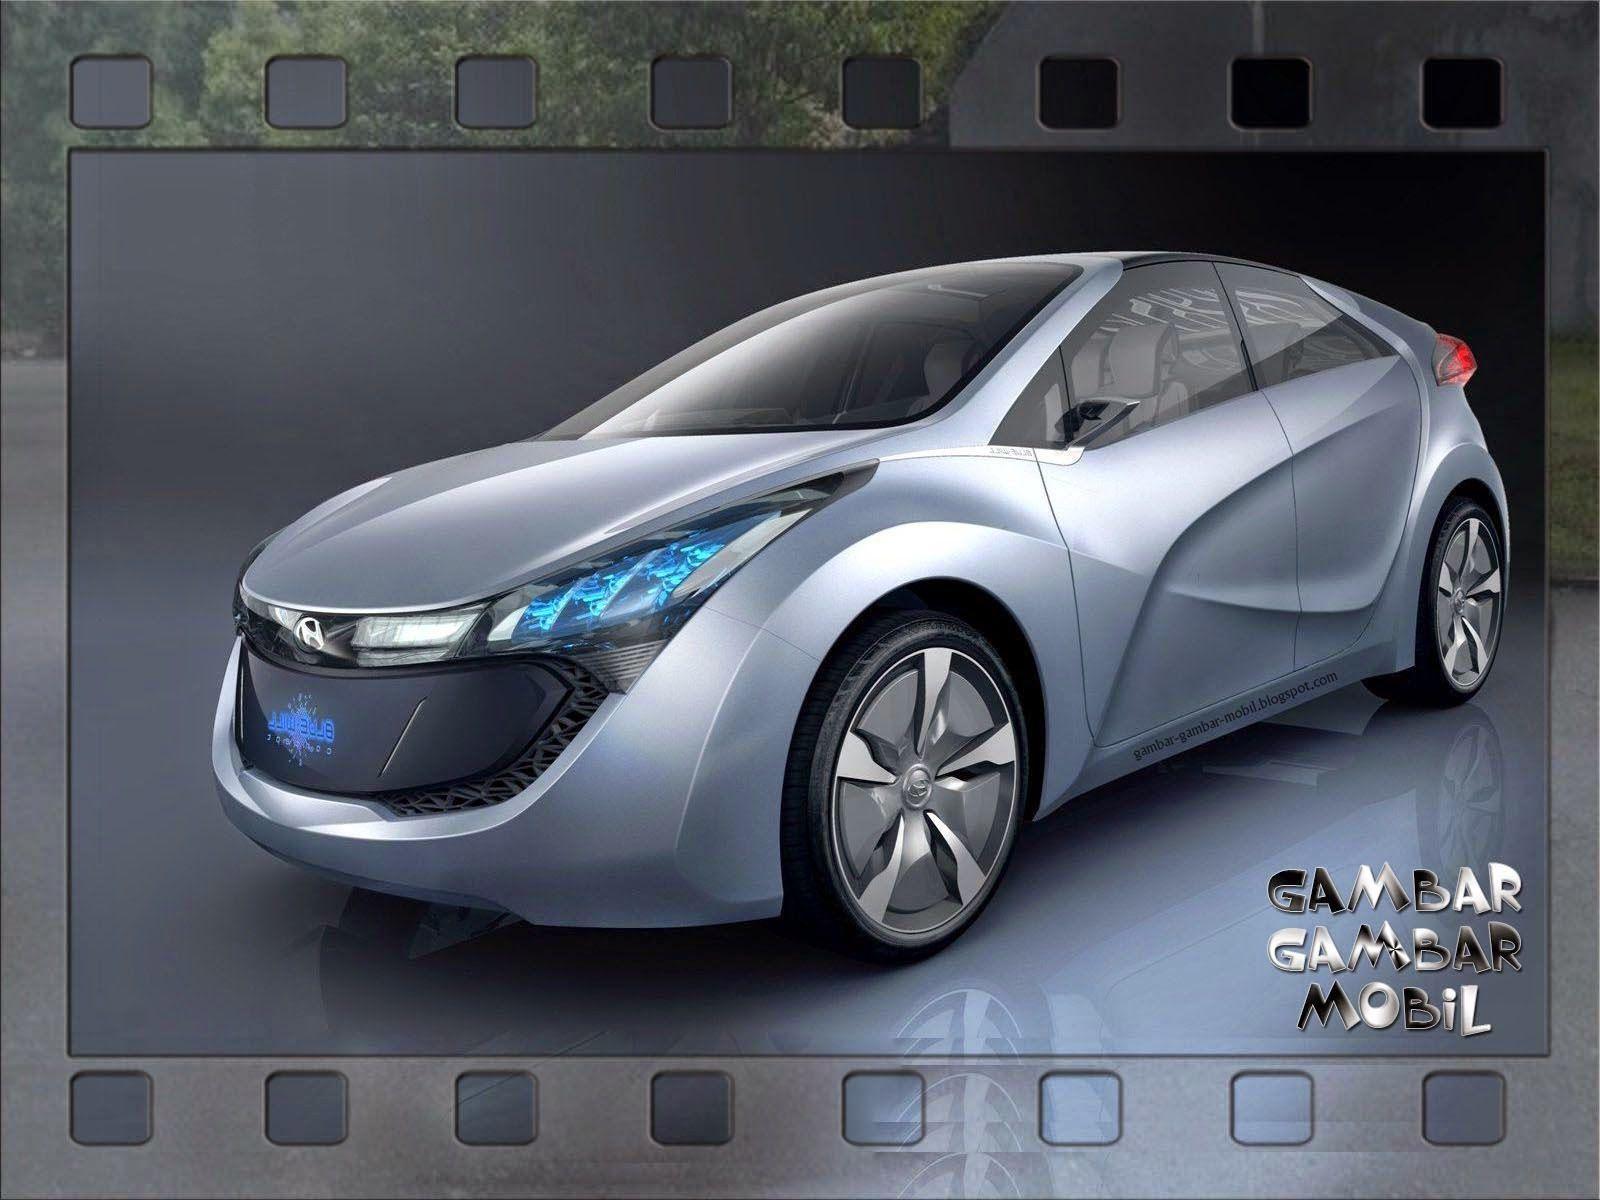 Gambar Mobil Hyundai Gambar Gambar Mobil Mobil Gambar